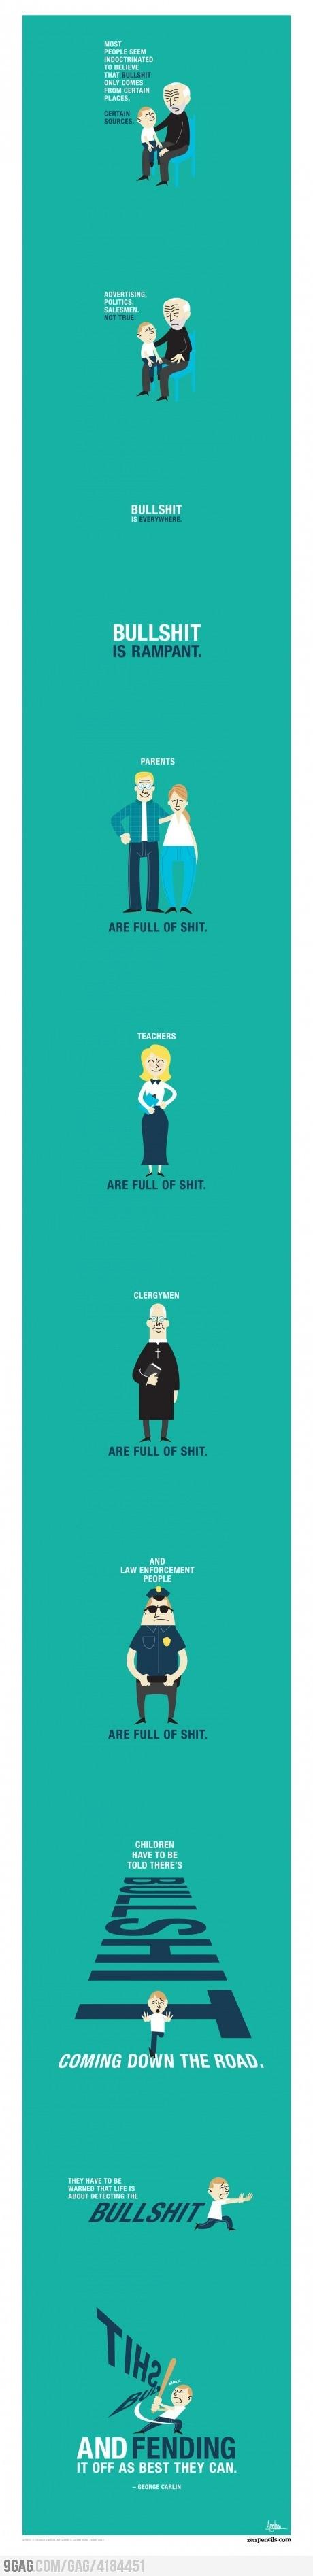 Just George Carlin...